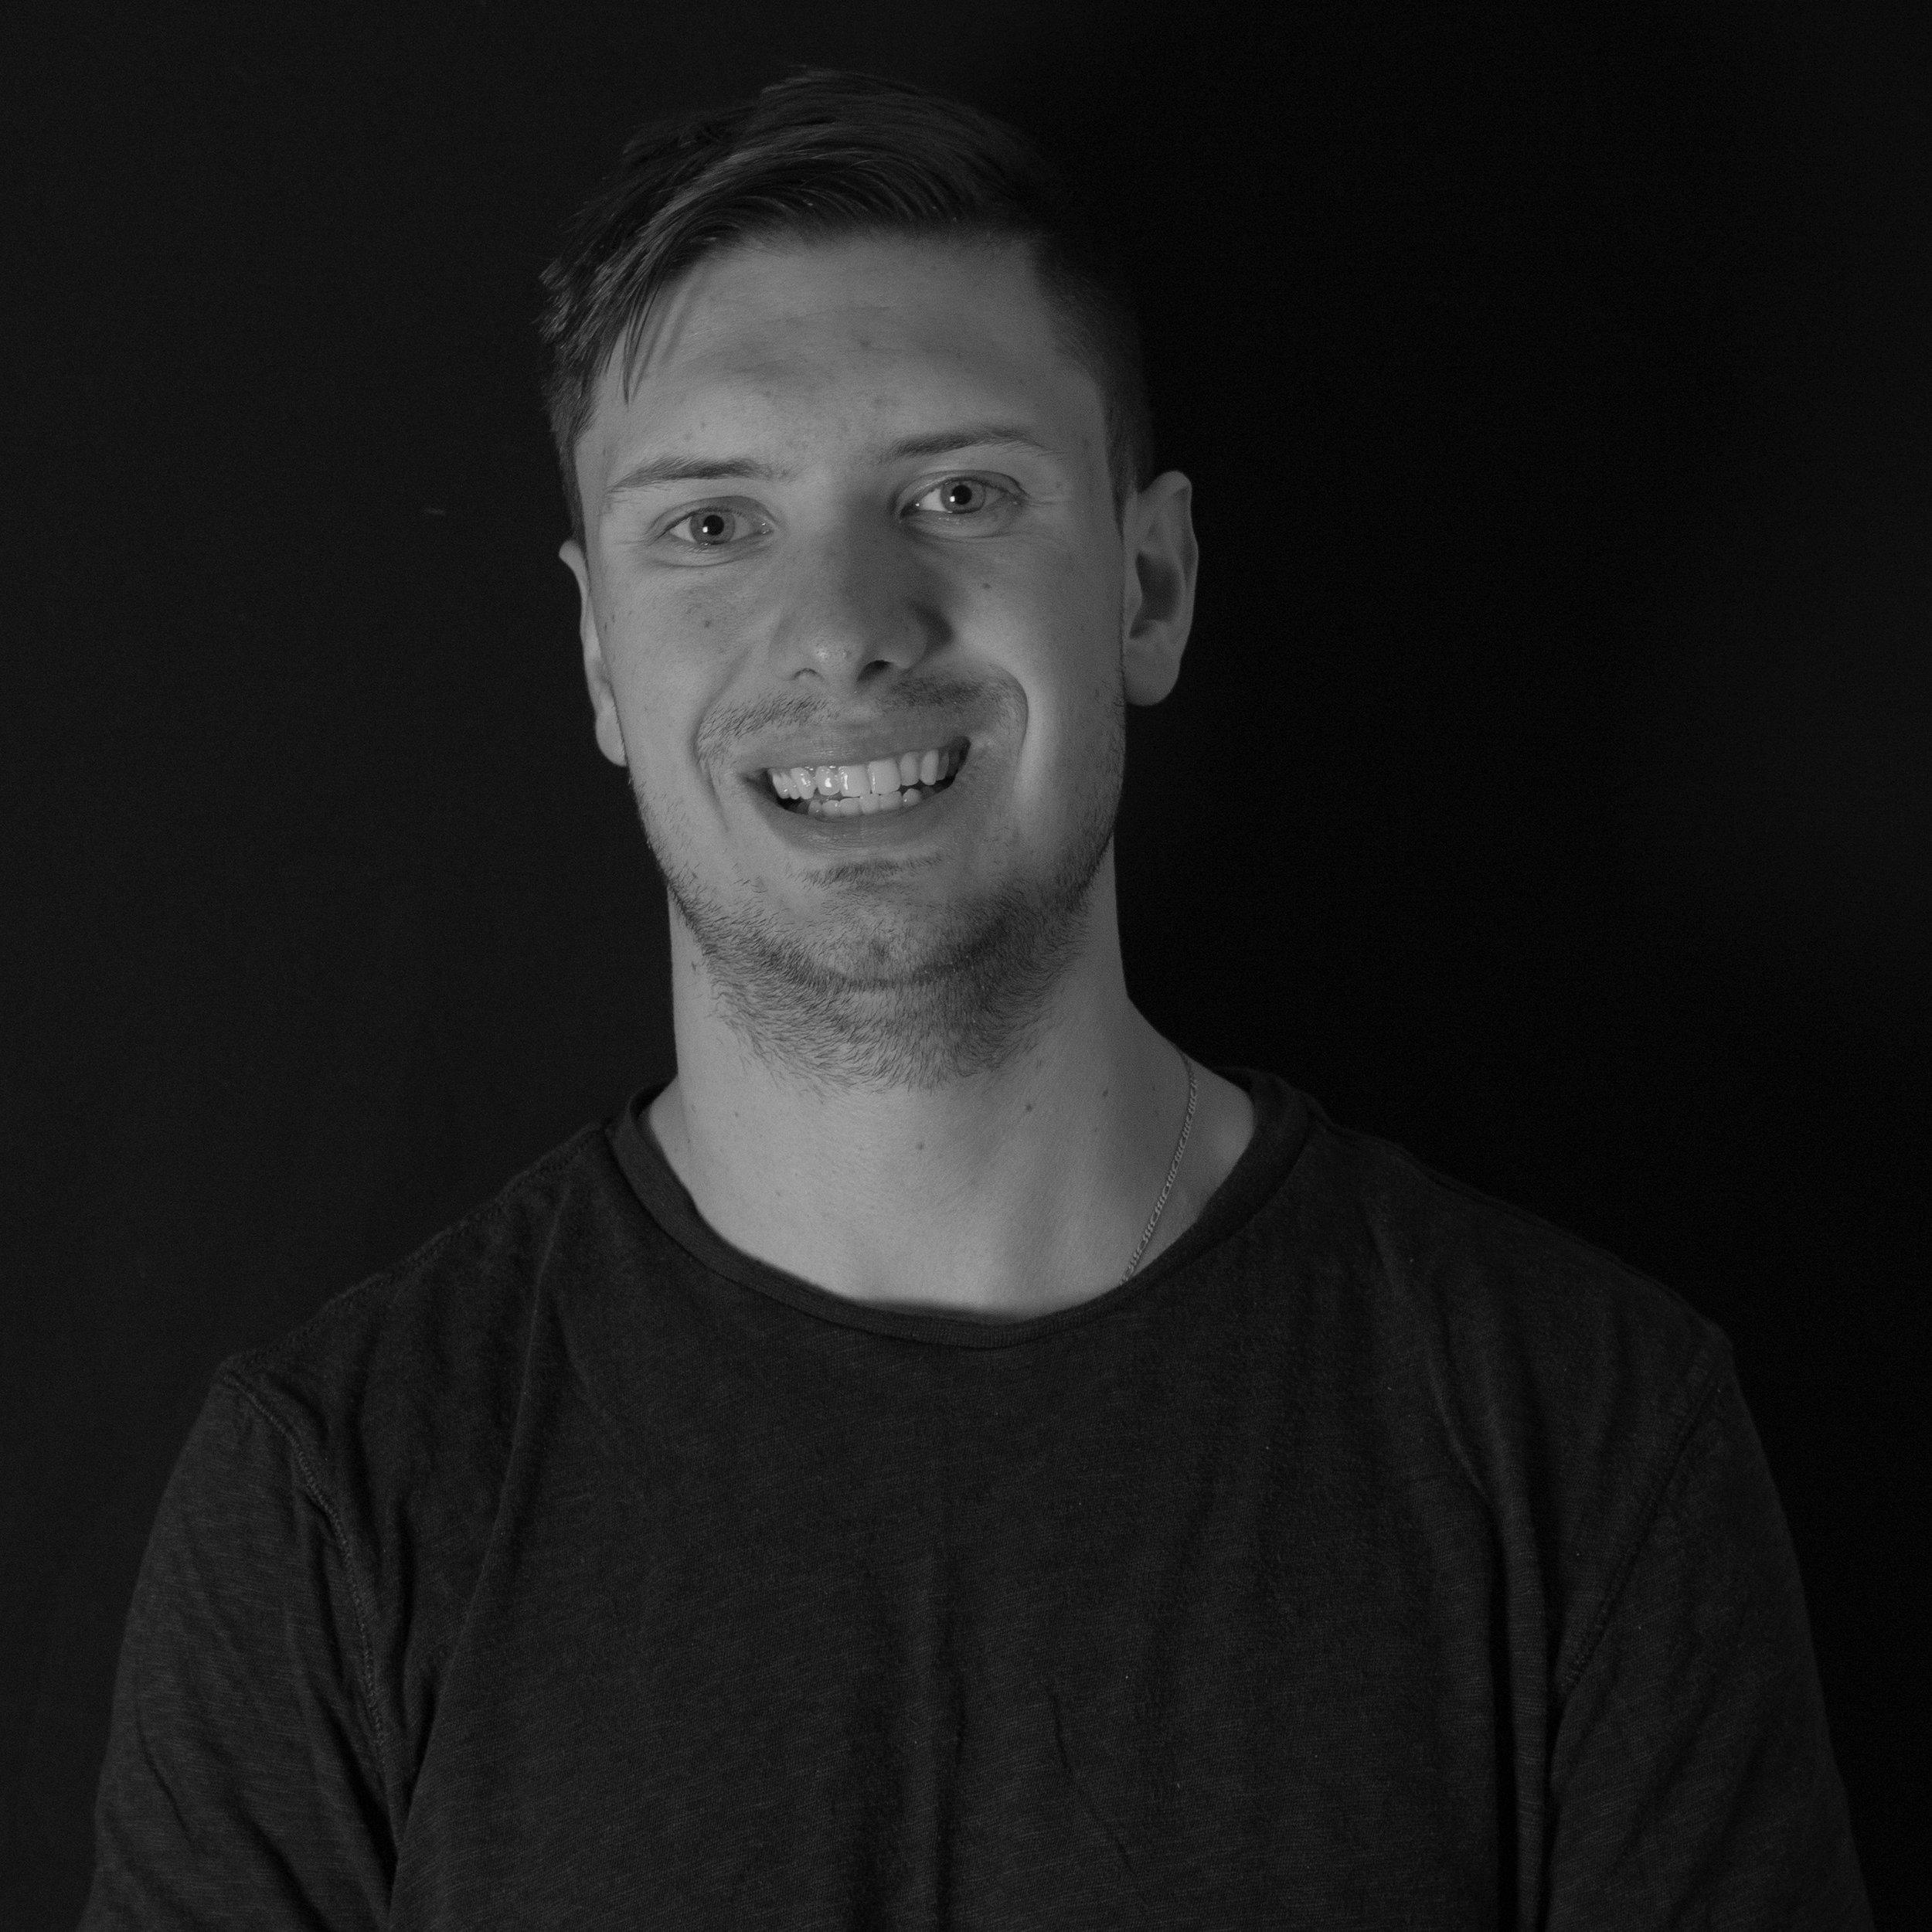 John Case - Producer / Editor